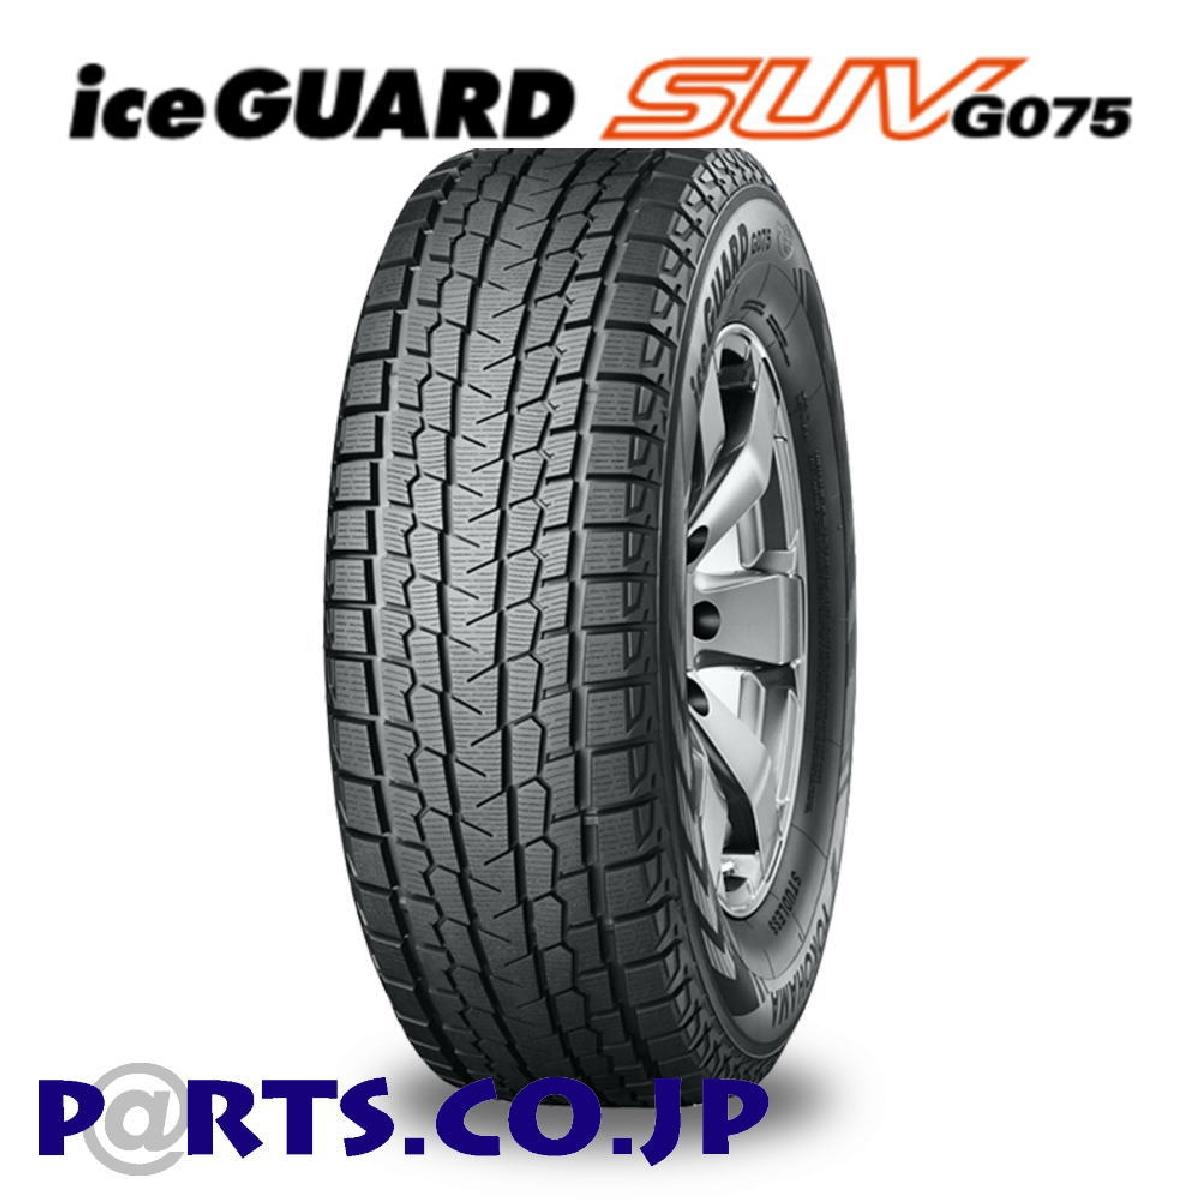 YOKOHAMA(ヨコハマ) iceGUARD SUV G075 275/60R20 116Q XL